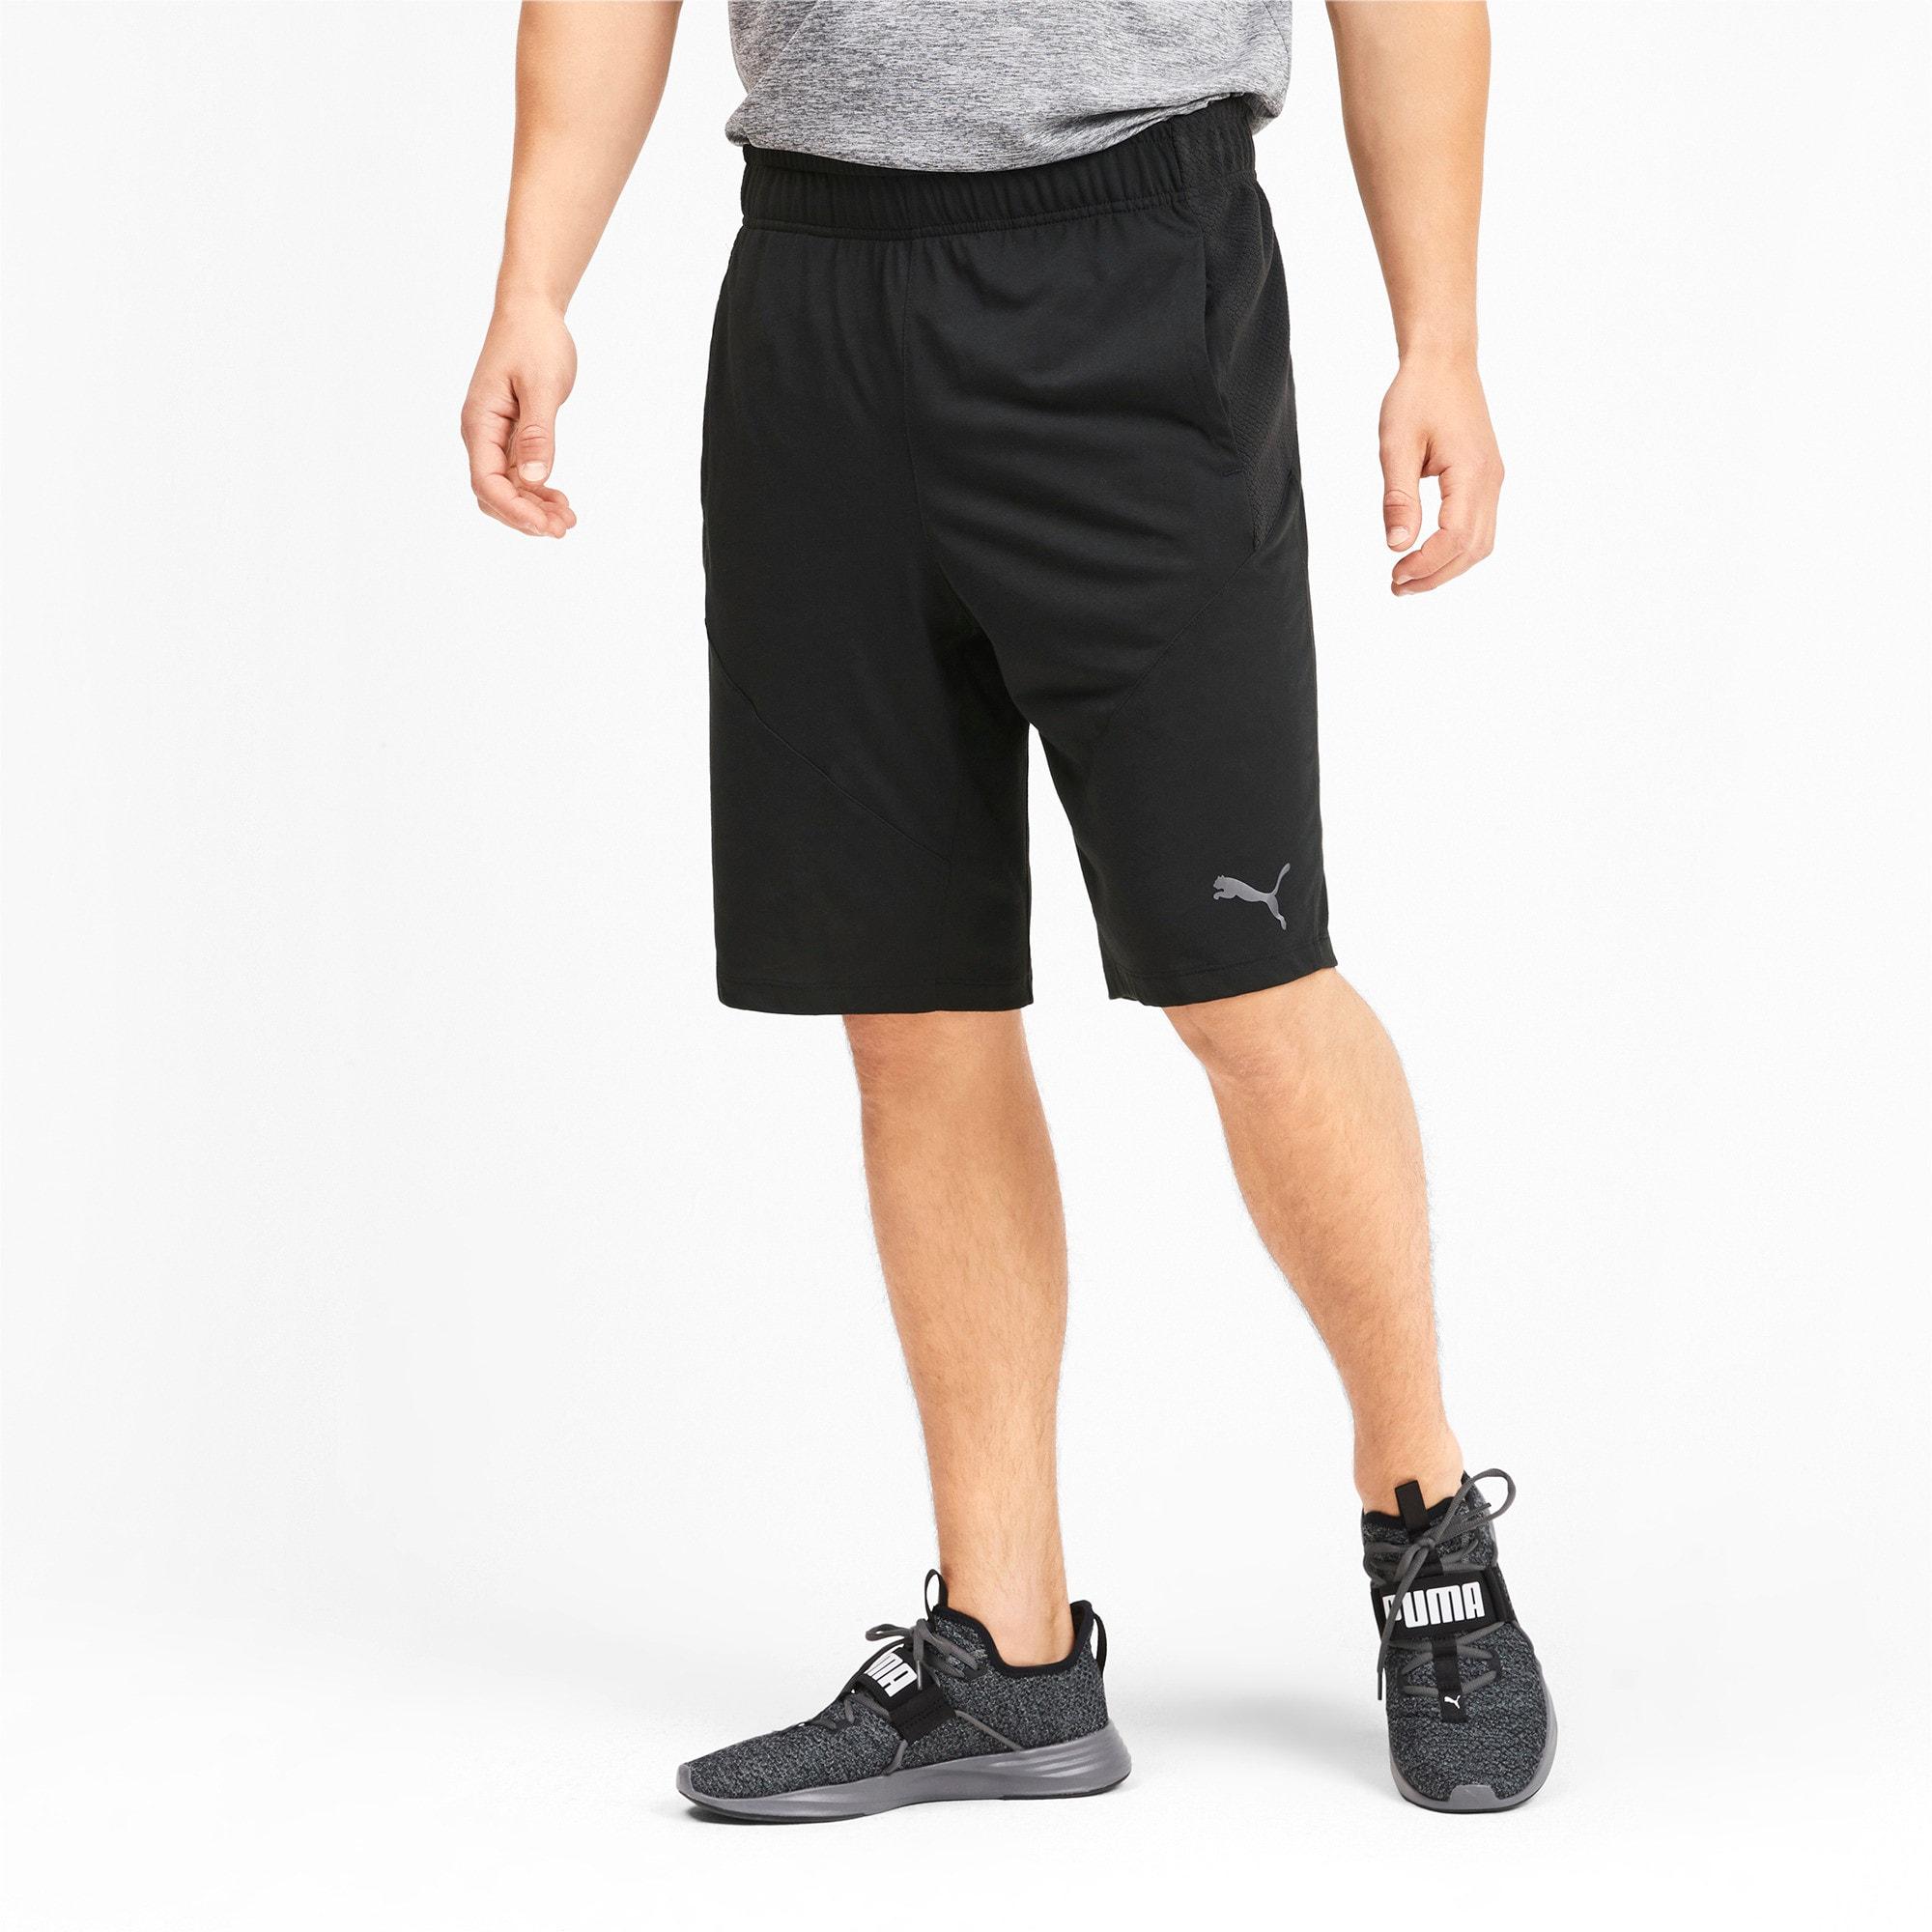 Miniatura 2 de Shorts Reactive Drirelease para hombre, Puma Black, mediano